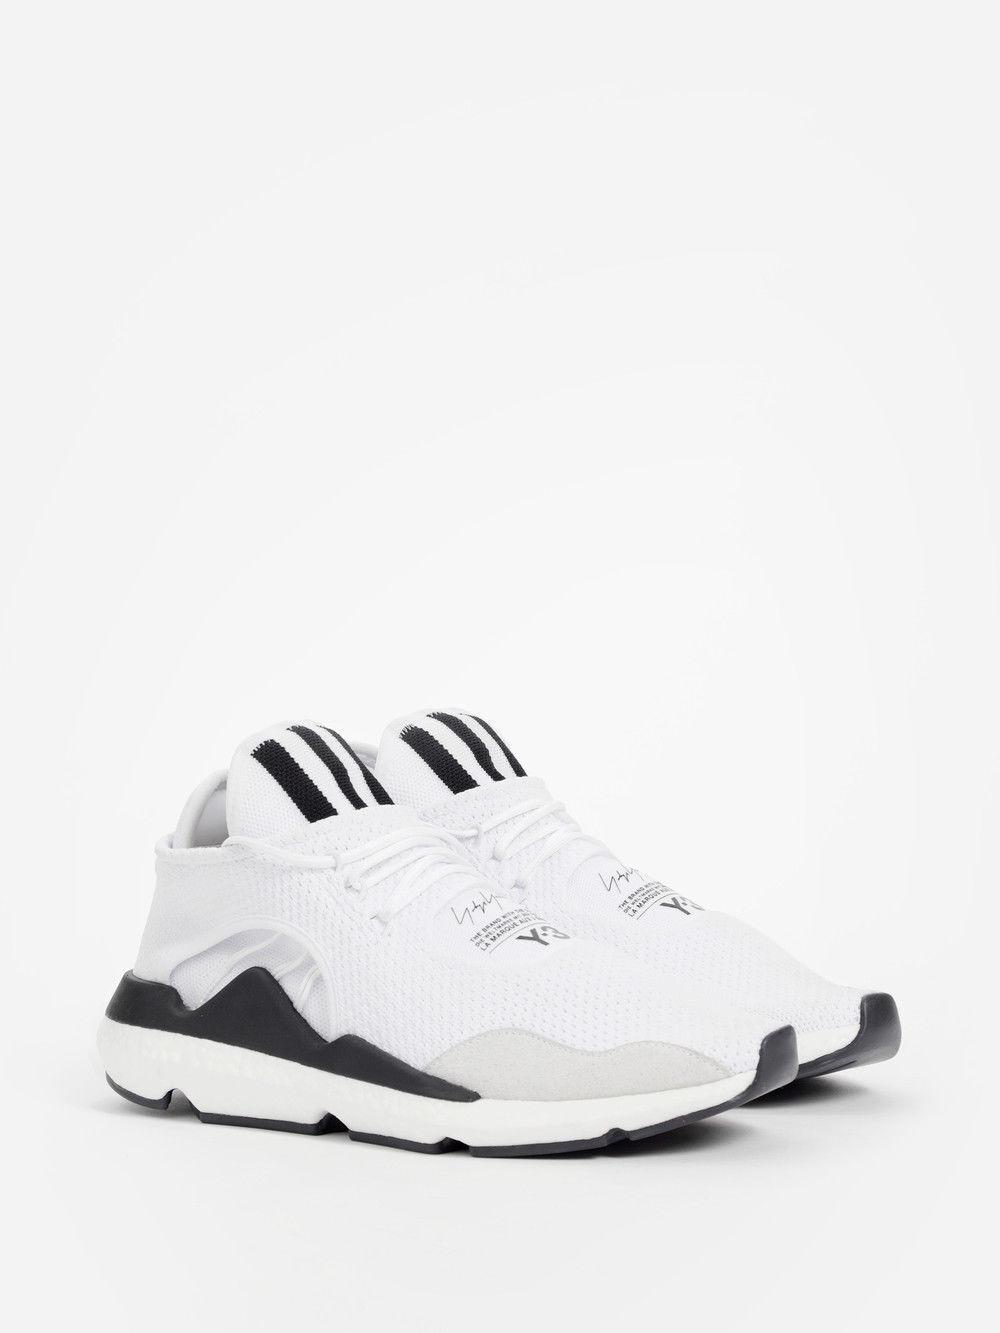 ADIDAS y-3 saikou Designer Porsche scarpe scarpe scarpe da ginnastica ac7195 gr 40 YOHJI YAMAMOTO NUOVO cde7b4